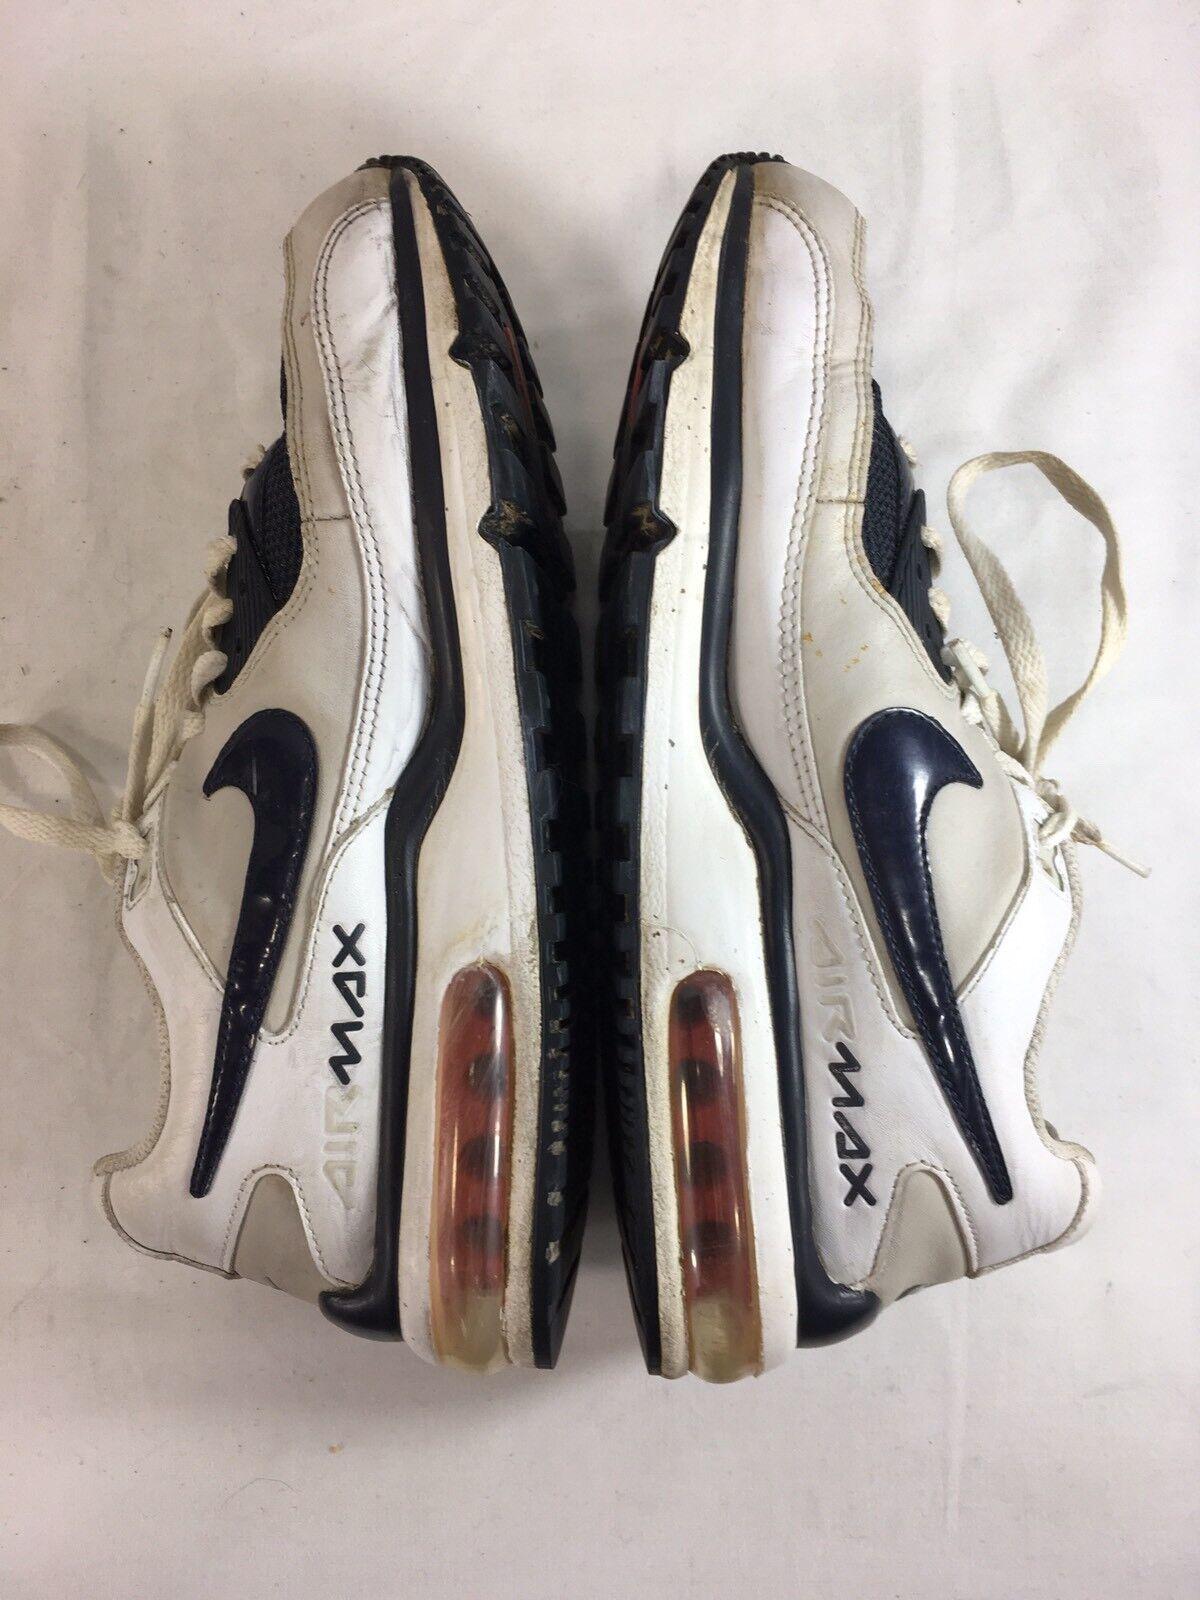 Nike Nike Nike air max scarpe, scarpe mens 9 bianco blu 317551-141 basso alto merletto   Imballaggio elegante e robusto    Uomo/Donne Scarpa  51d7b7